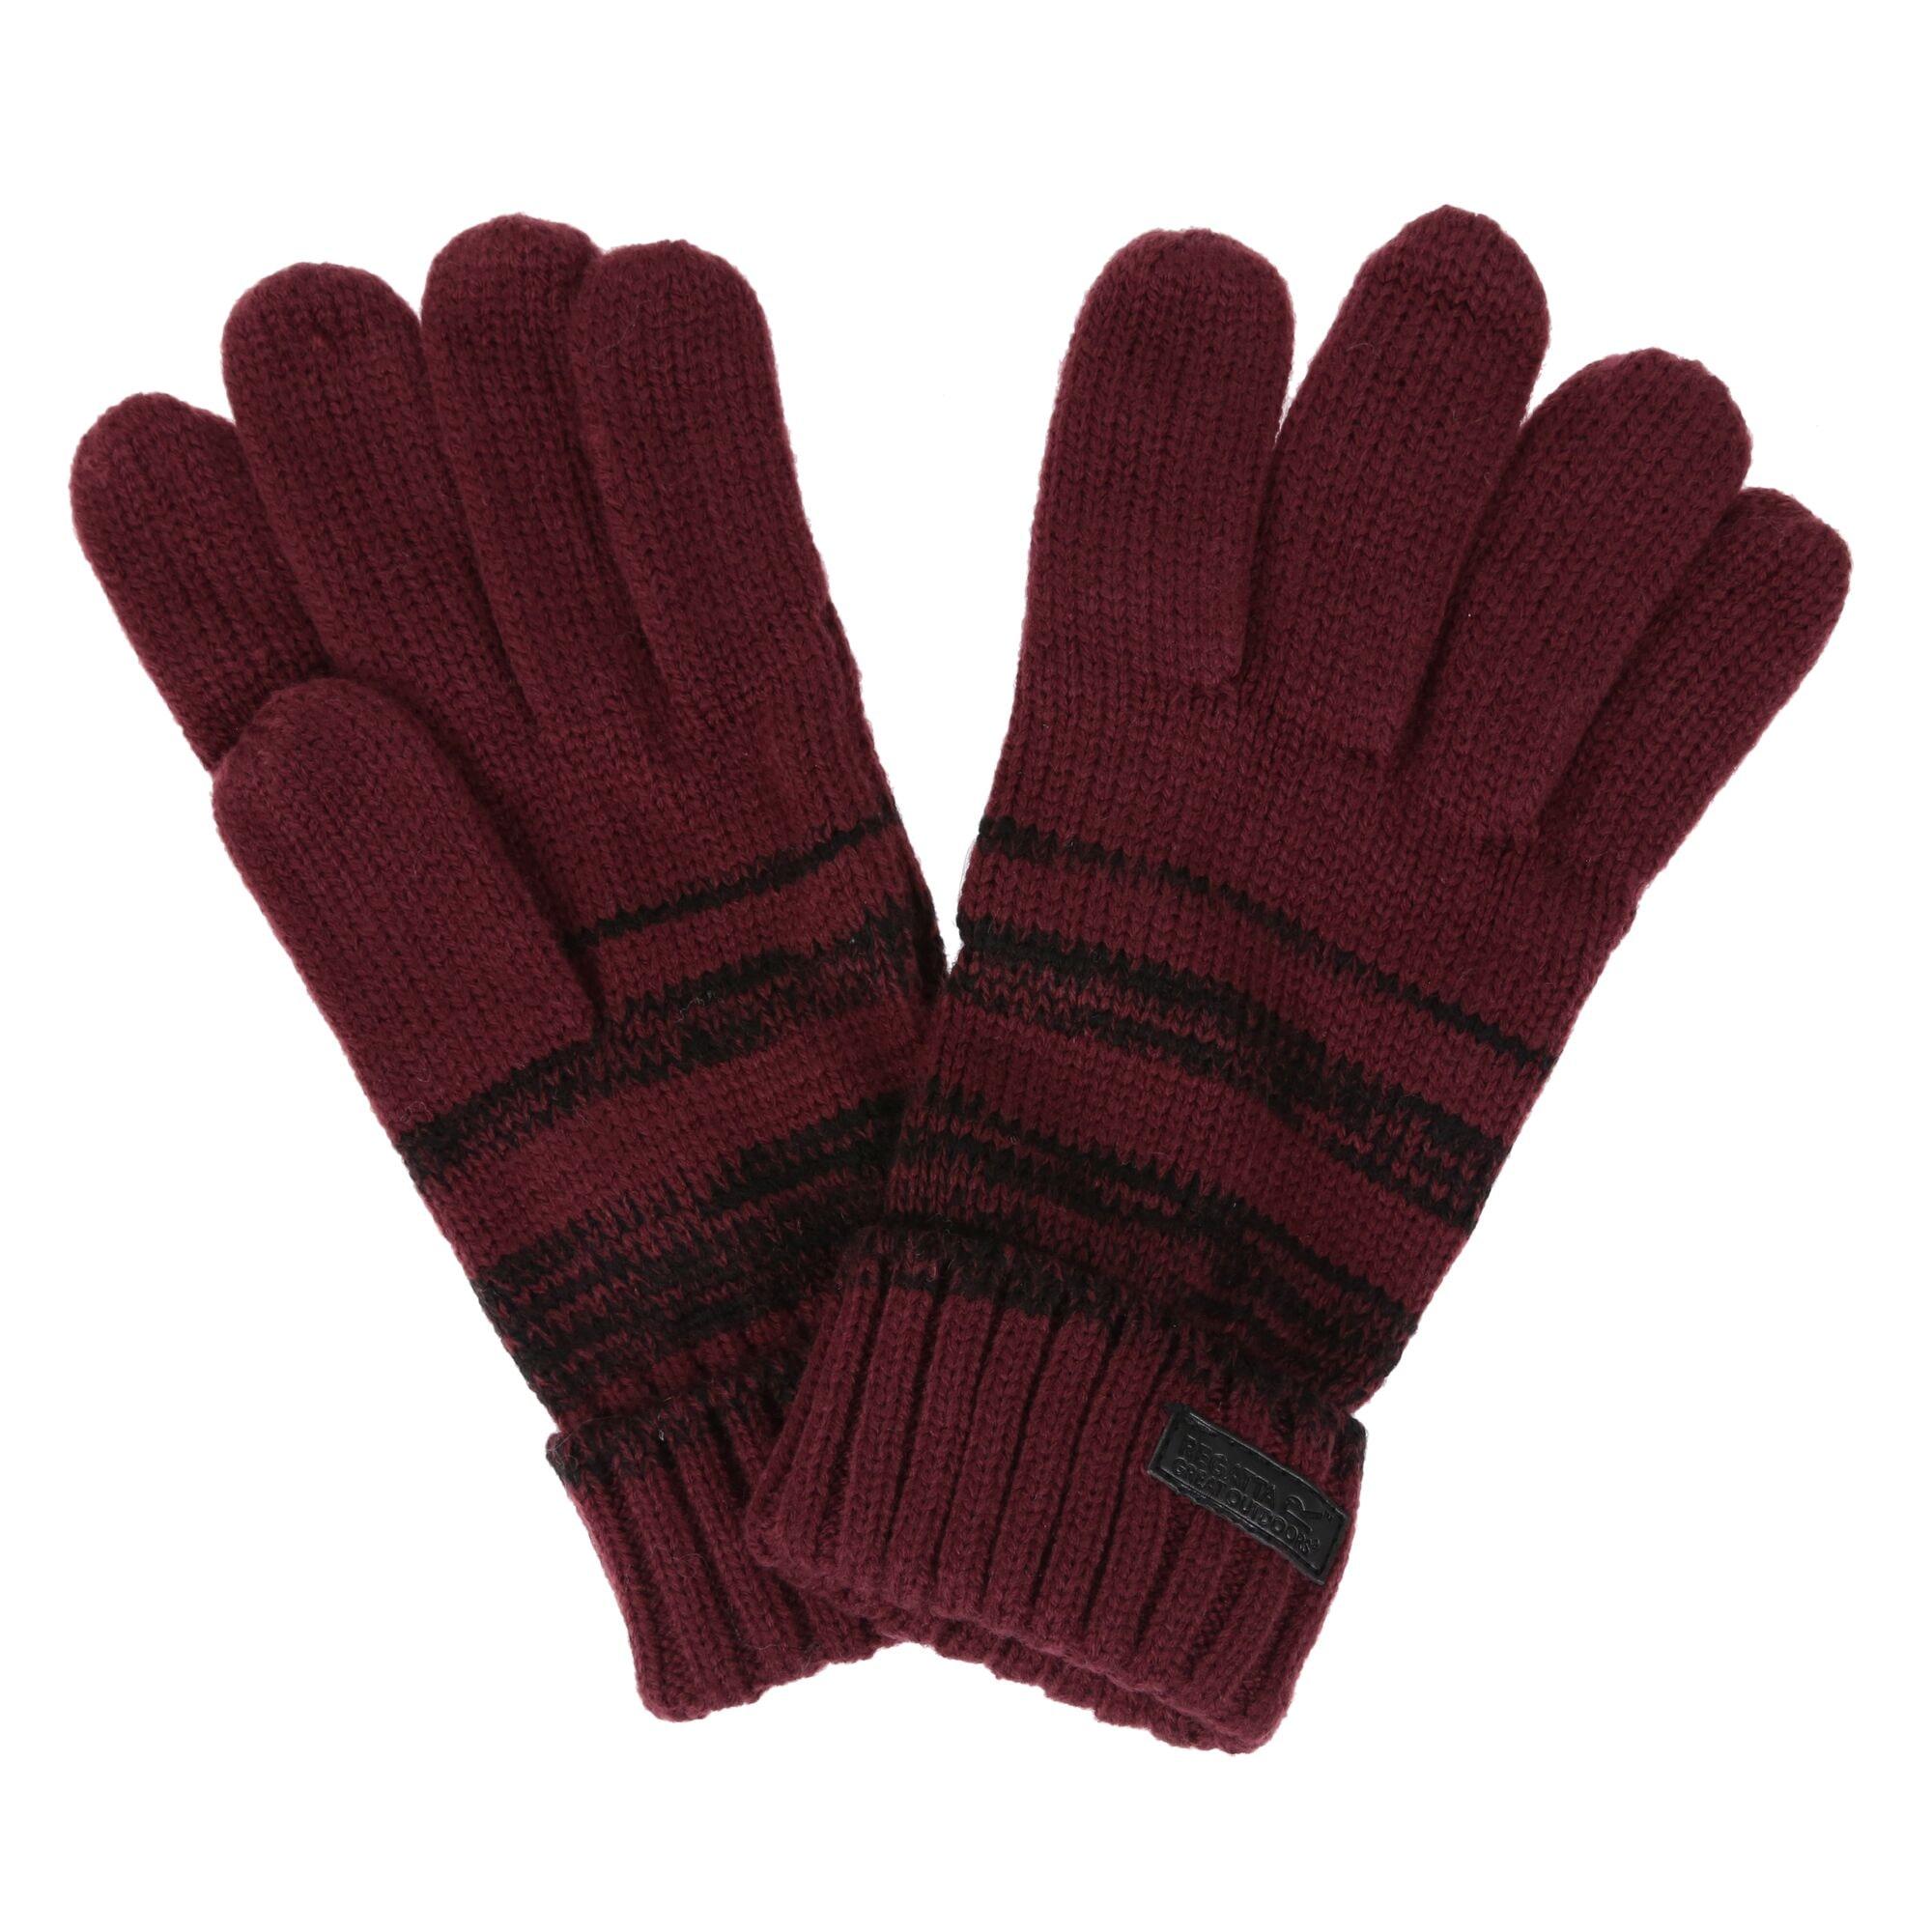 Regatta Strickhandschuhe Great Outdoors Herren Davion | Accessoires > Handschuhe > Strickhandschuhe | Regatta